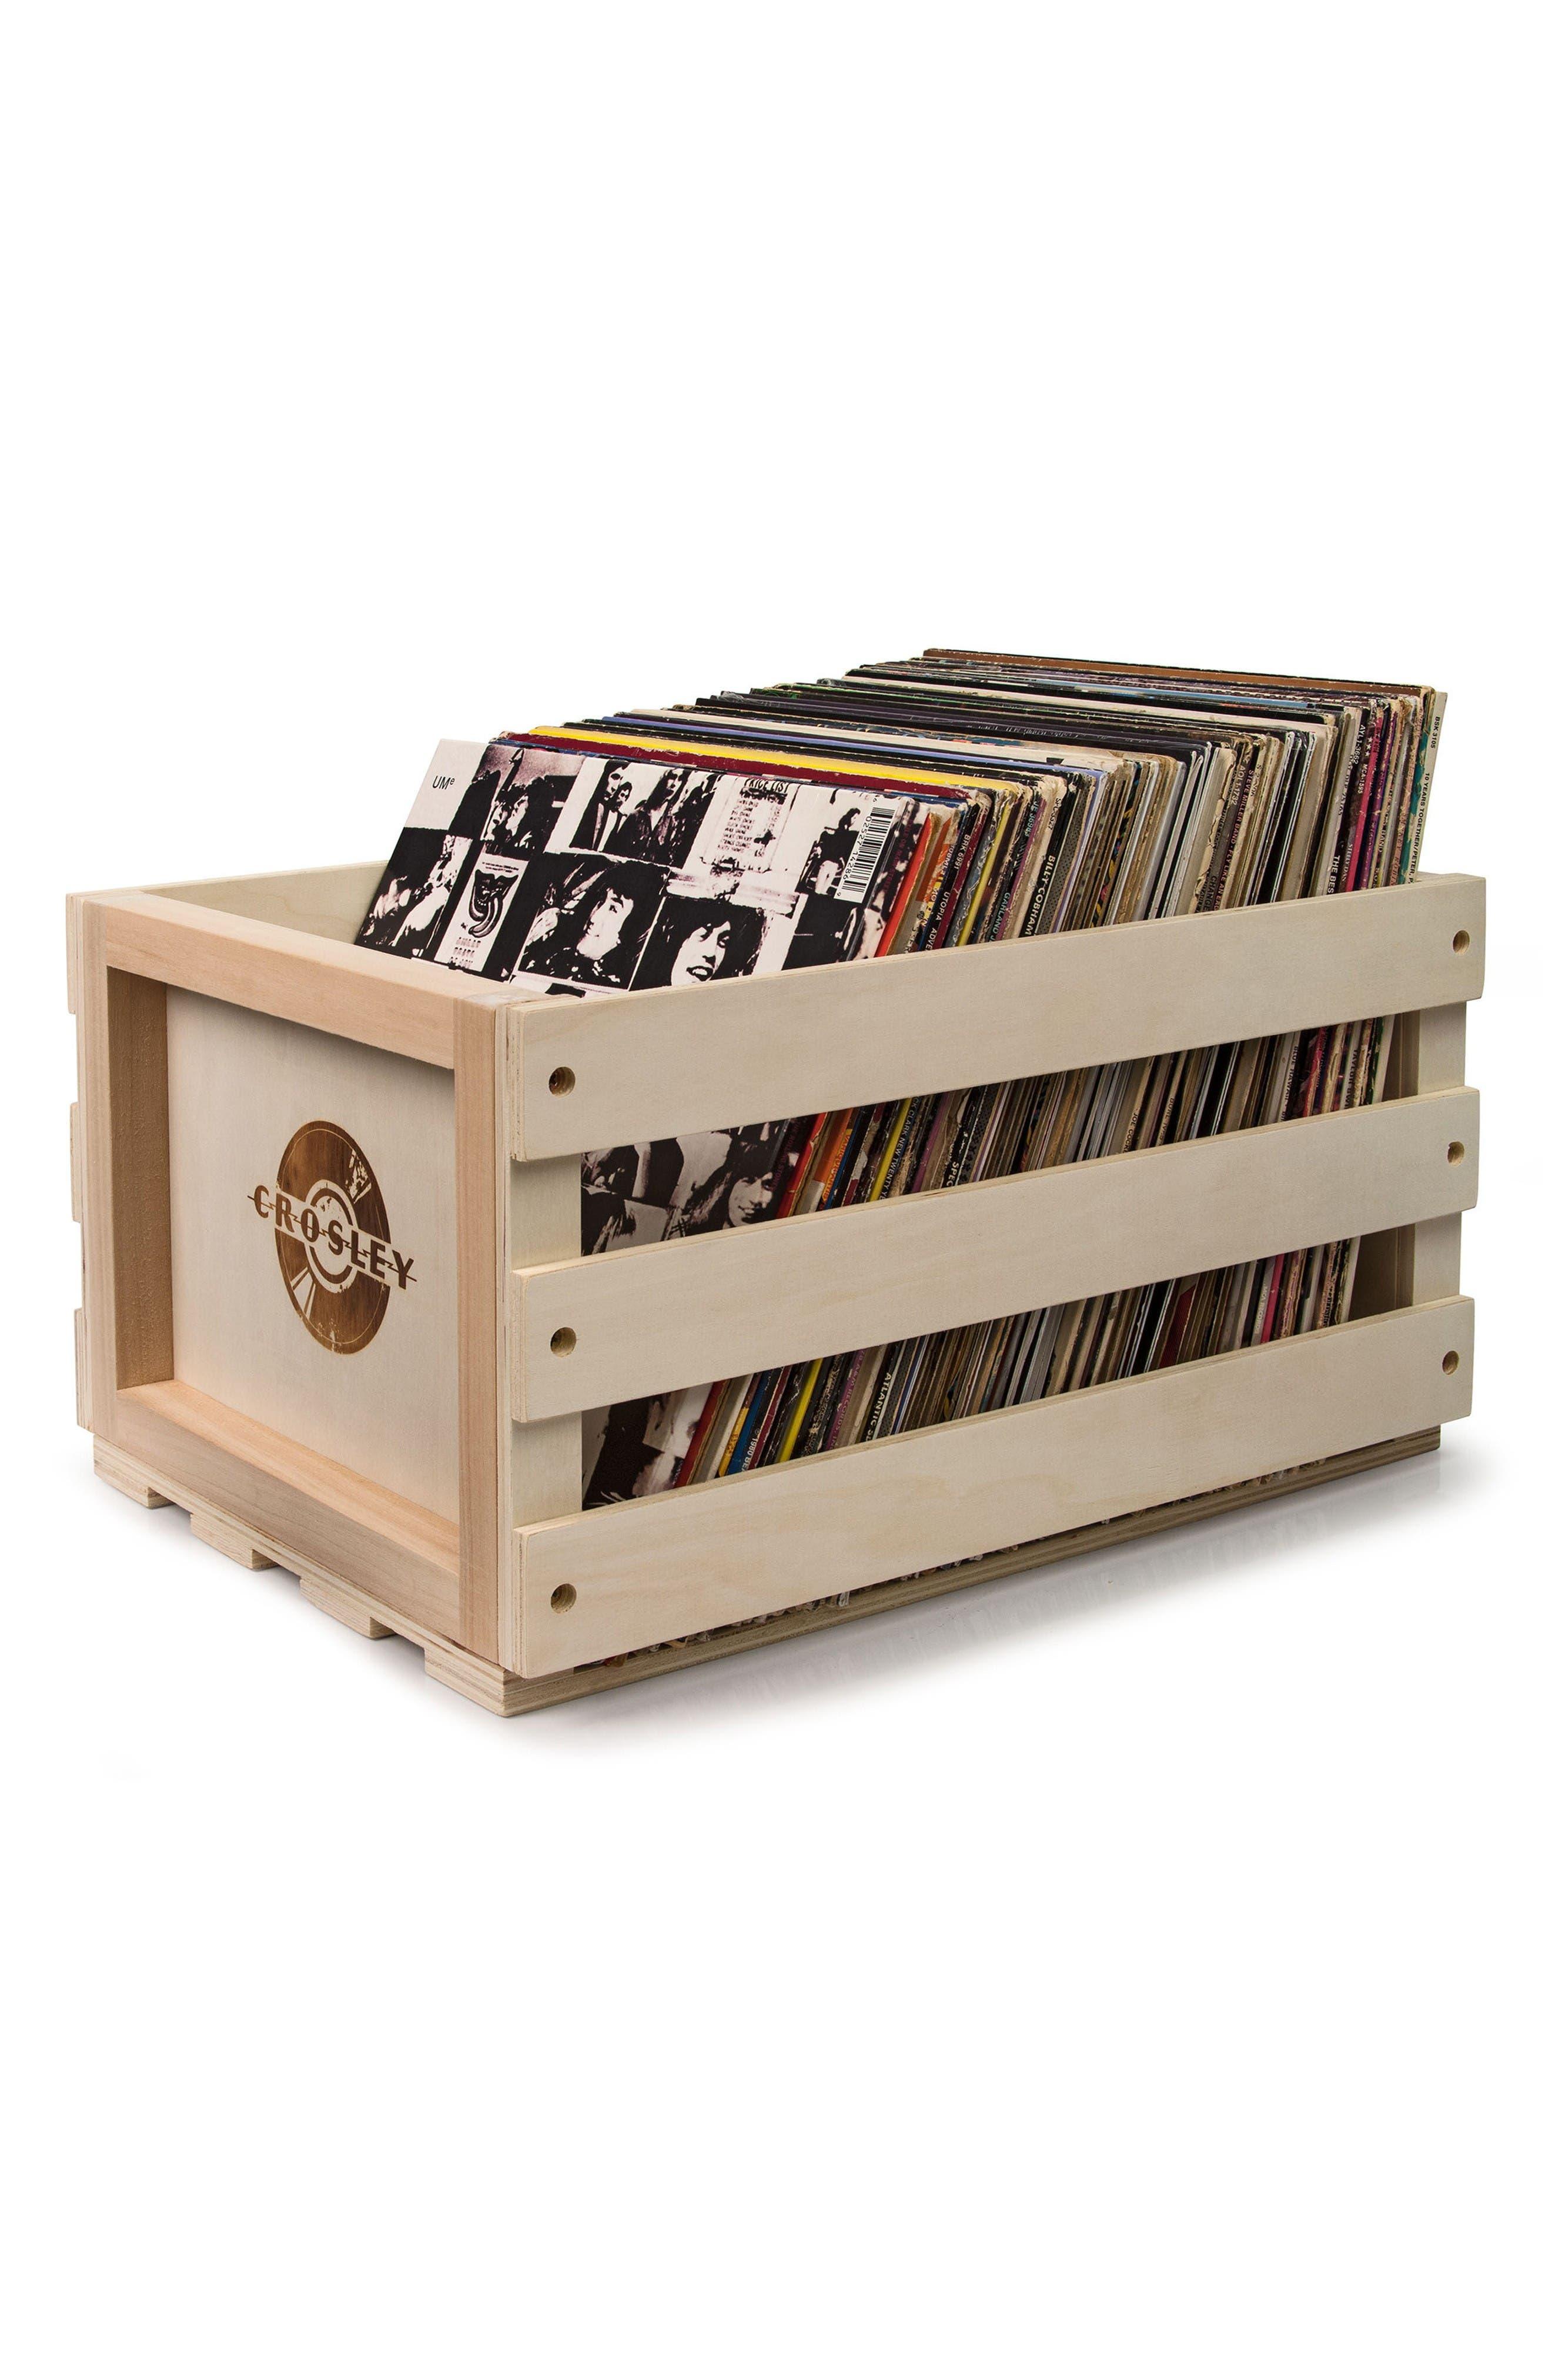 Main Image - Crosley Radio Record Storage Crate